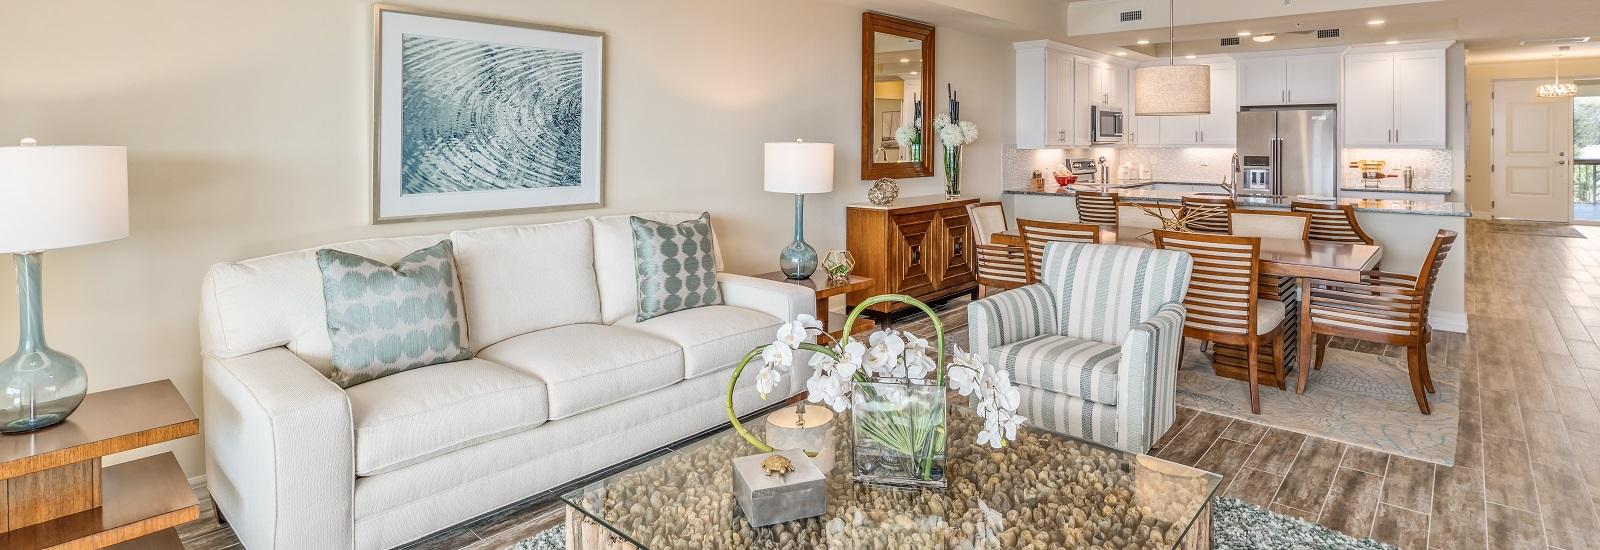 EdgewaterHB-livingroom-model.jpg